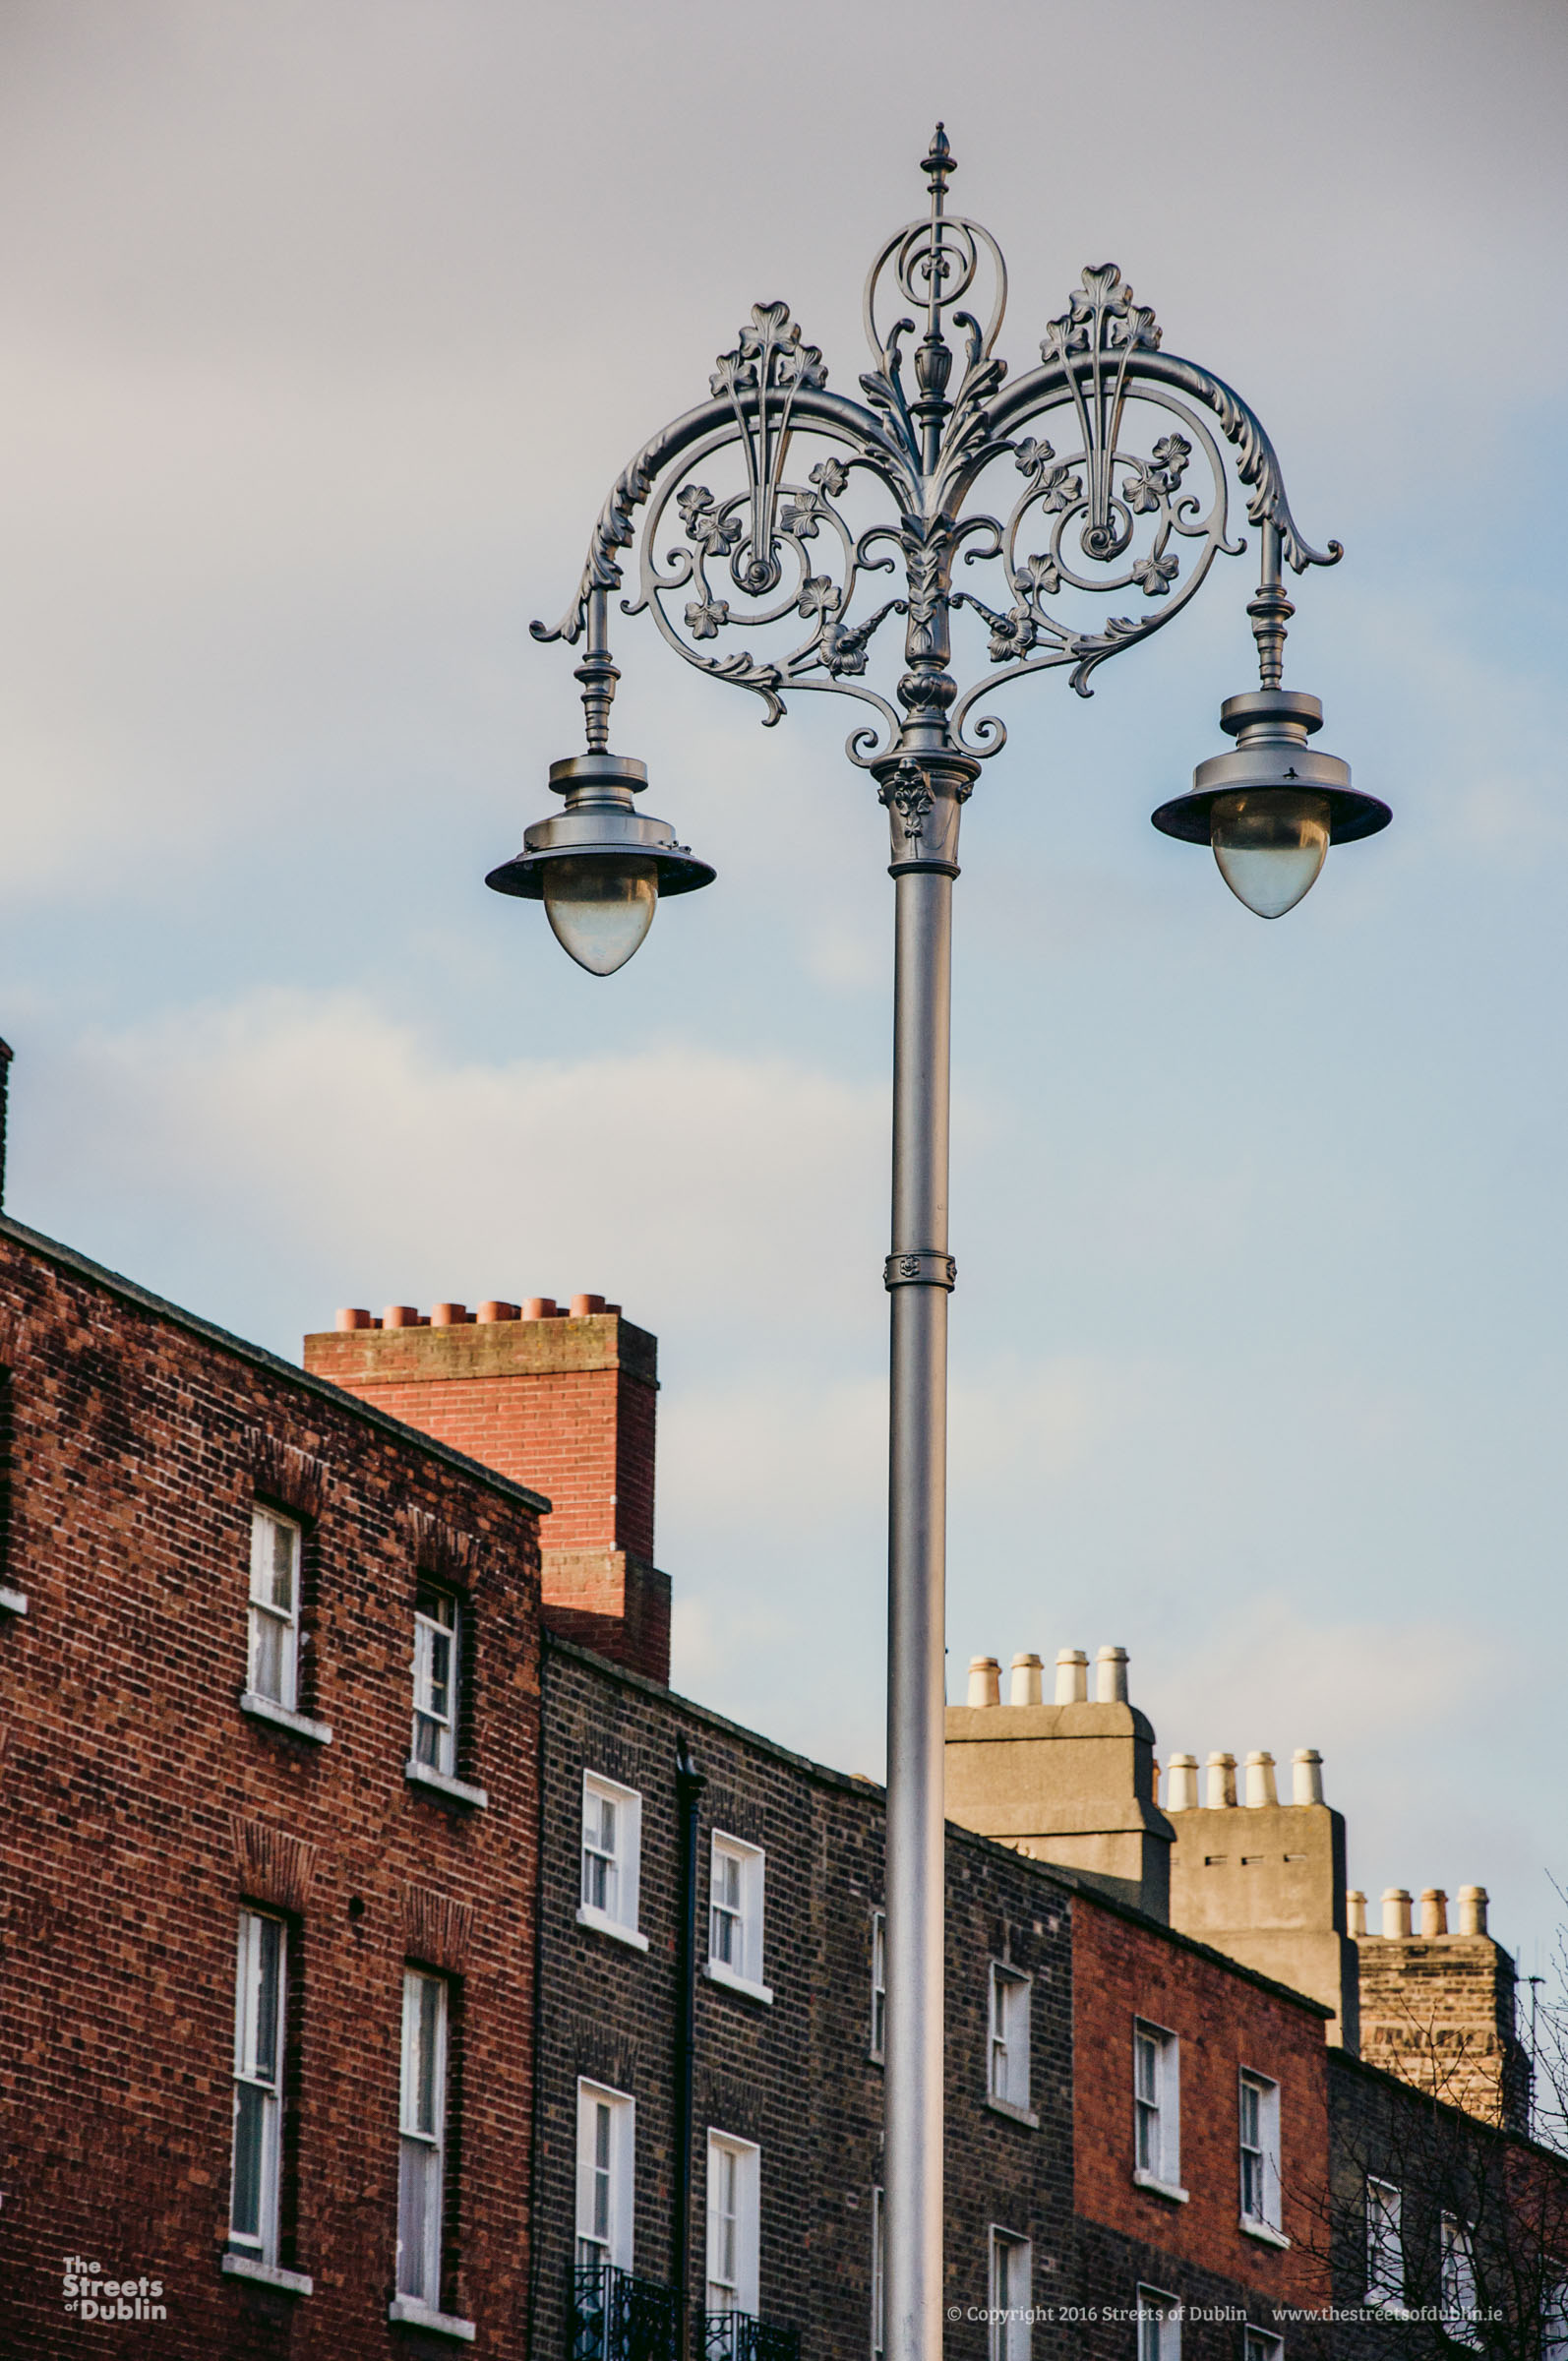 Streets-of-Dublin-Photo-716.jpg